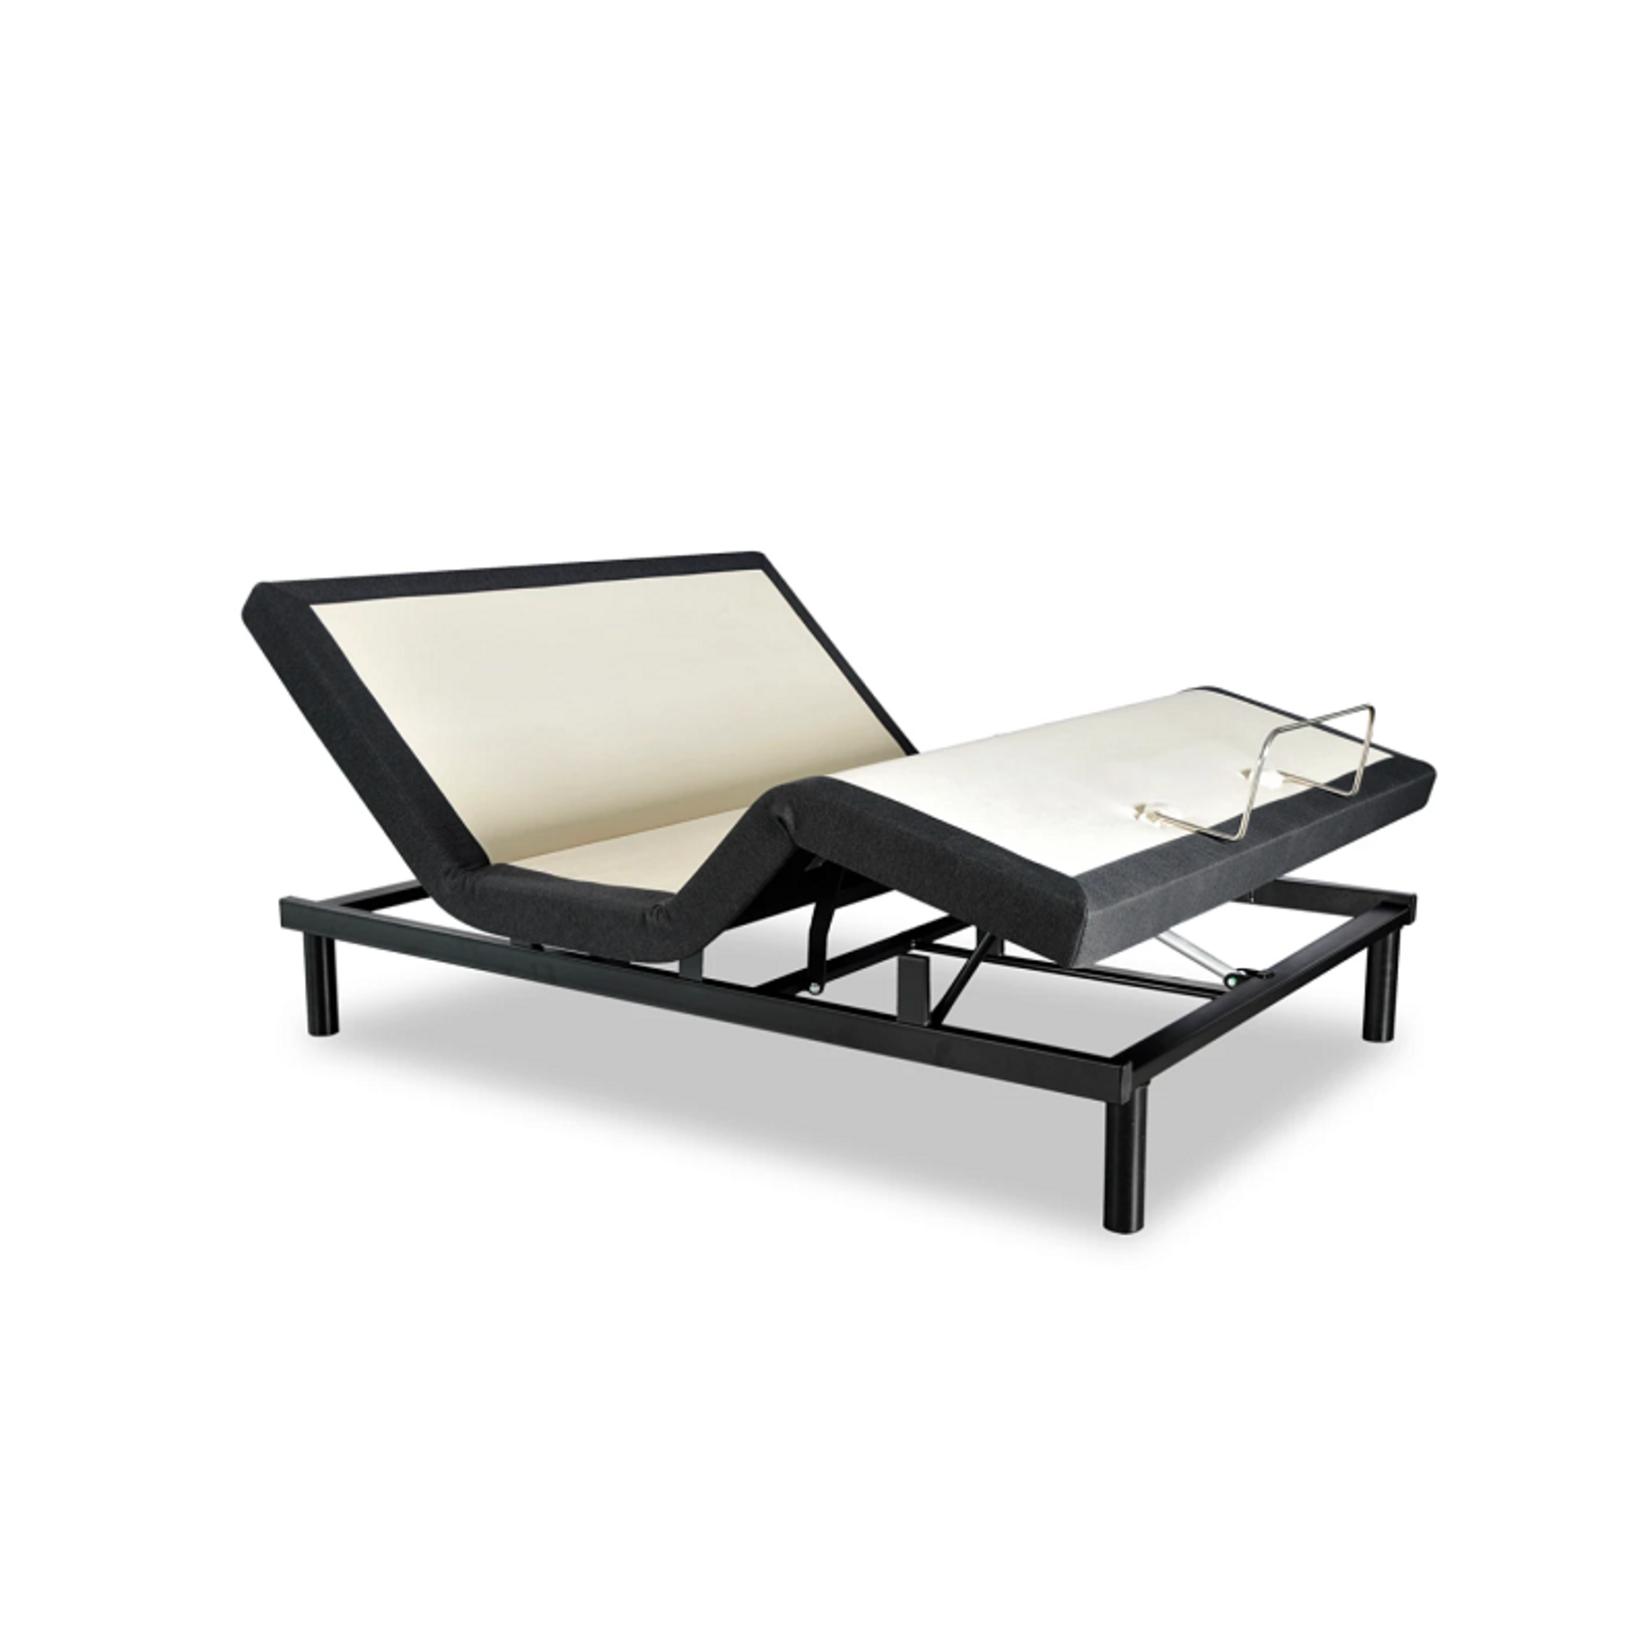 Sealy Reflexion® Boost 2.0 Ease Lifestyle Adjustable Power Base-Split King